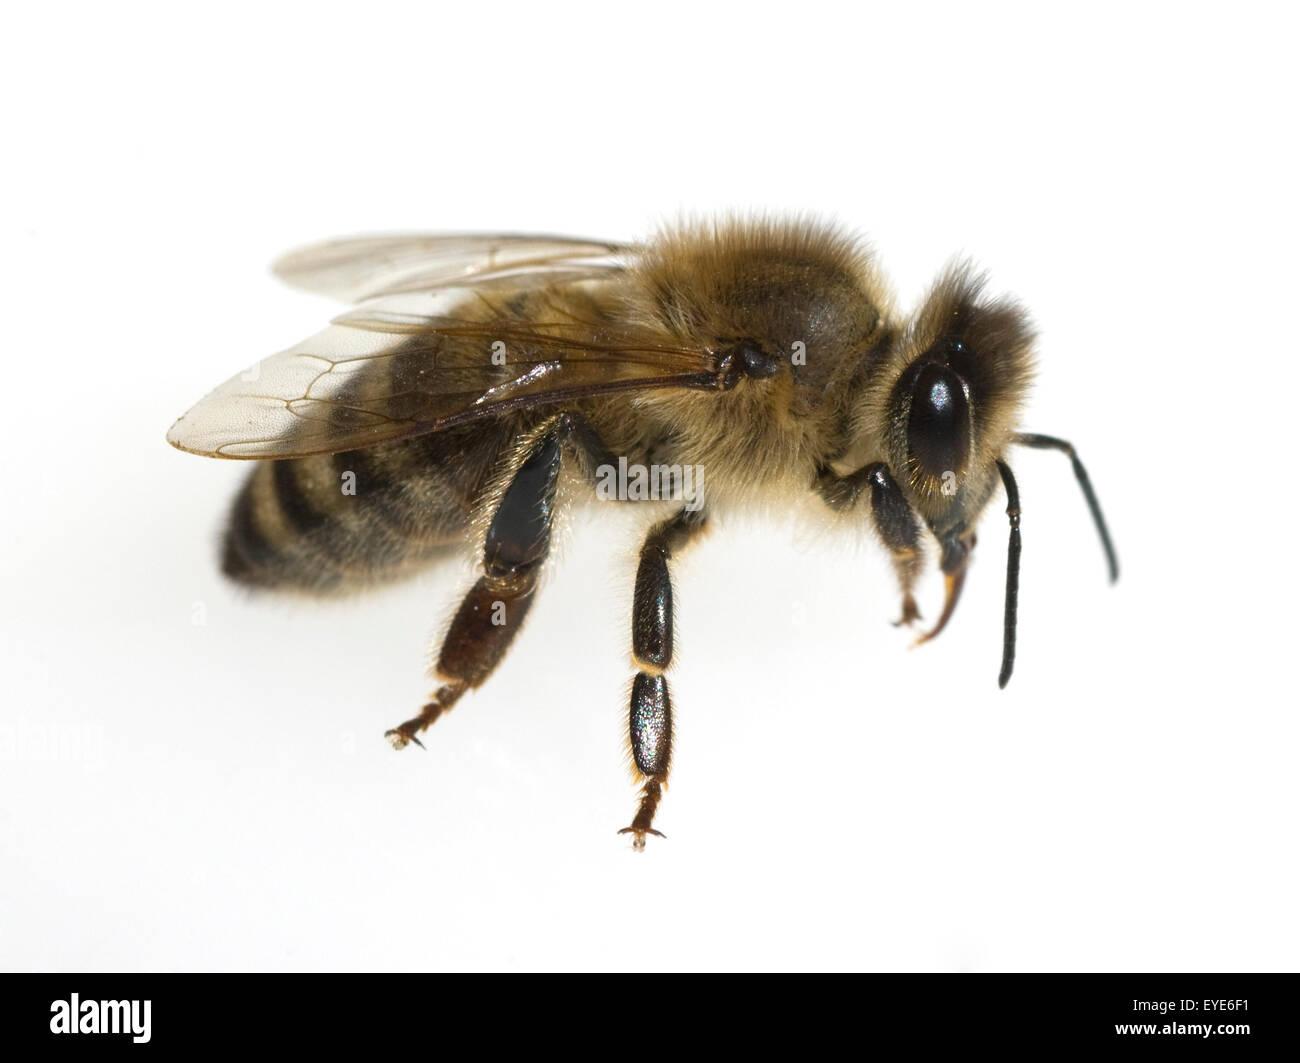 Biene, Apis mellifera; Honigbiene; Insekt - Stock Image